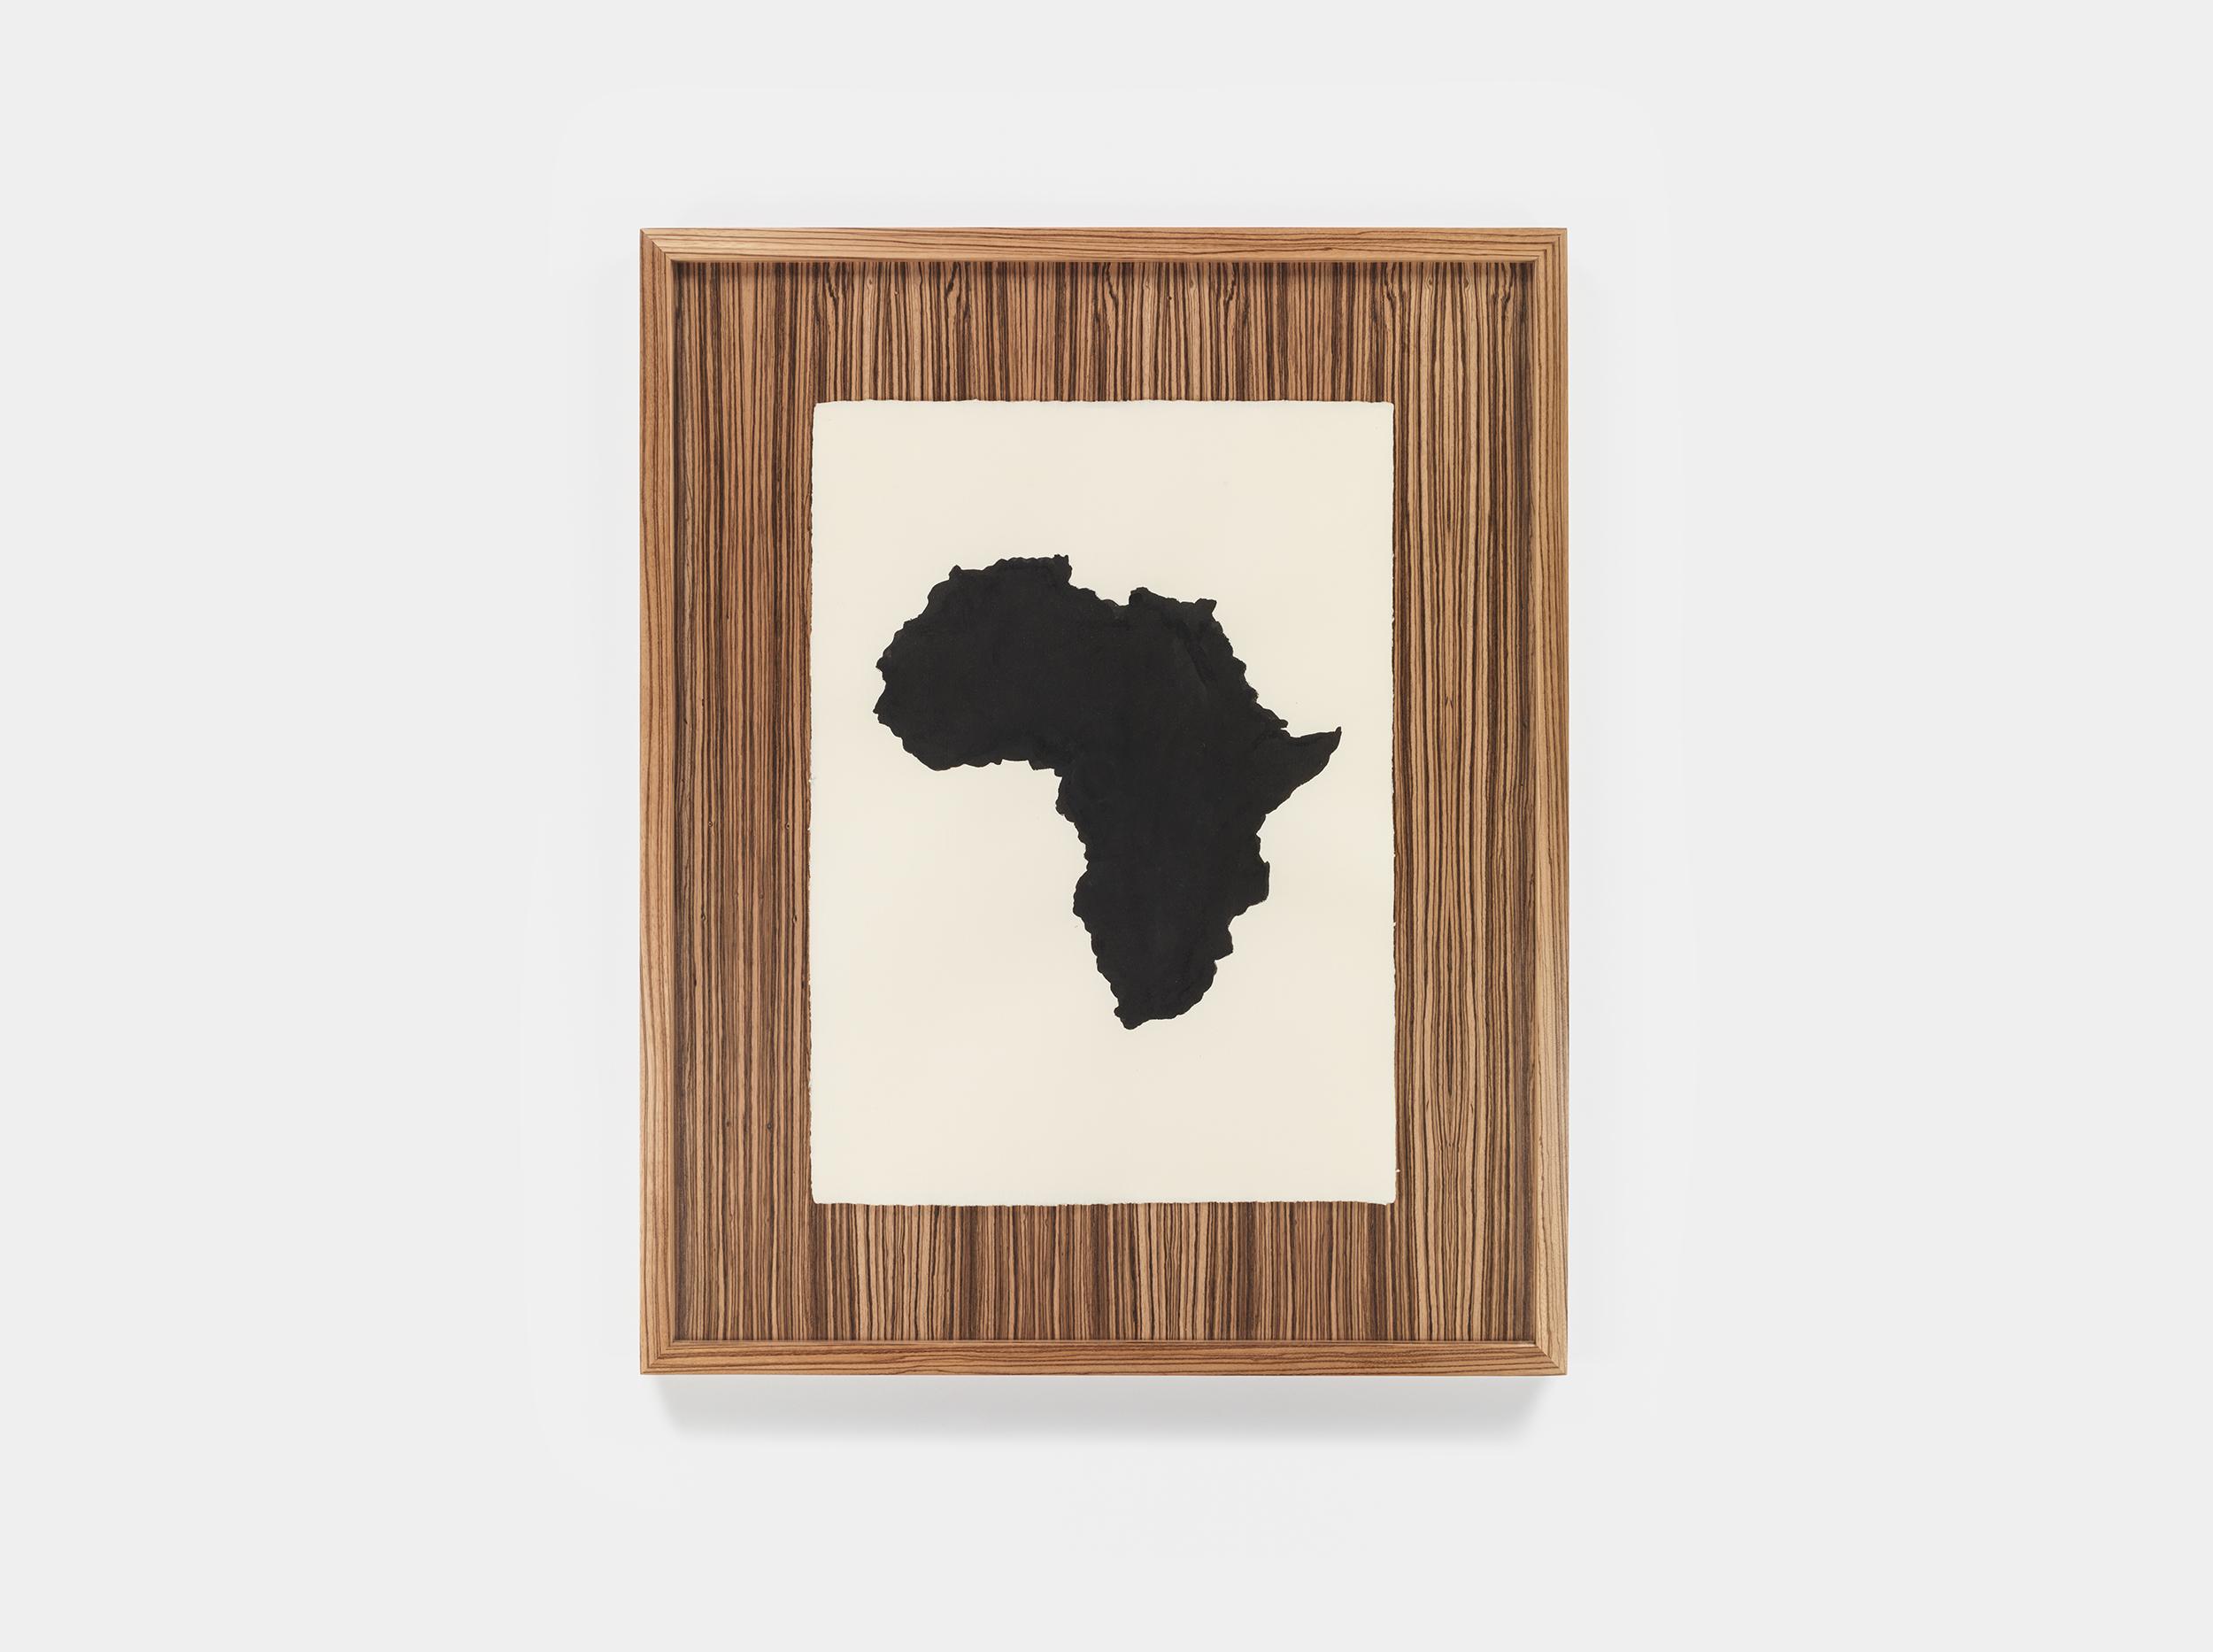 Africa_2014_NickPoe.jpg